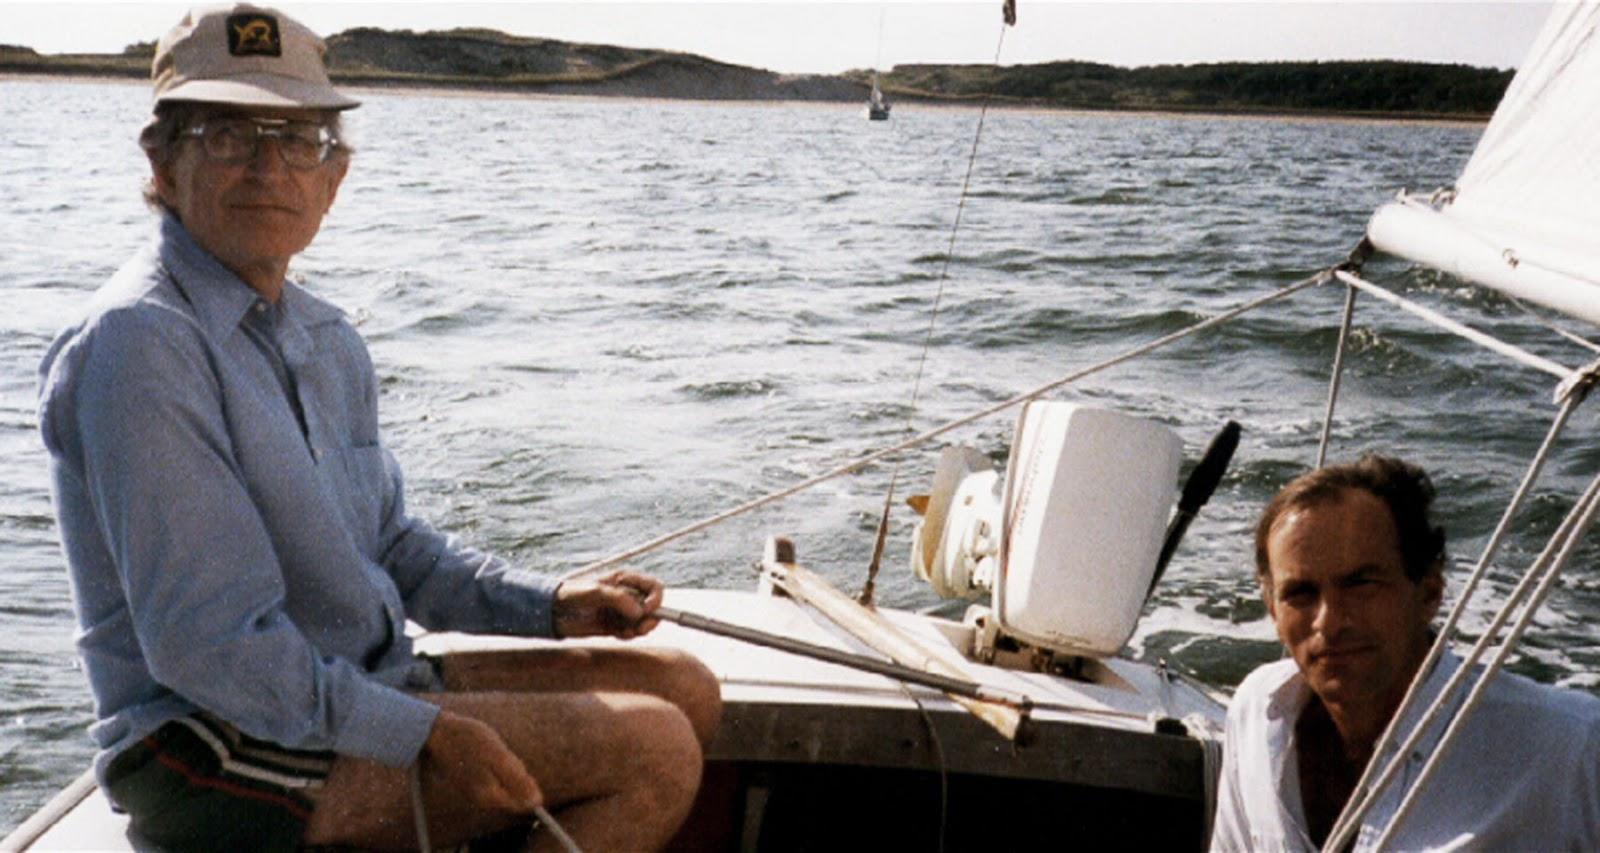 http://1.bp.blogspot.com/-x3epre0pw5Y/UU7NypwxigI/AAAAAAAAGbQ/v5mSCAKbLoU/s1600/Norman-and-Noam-sailing.jpg